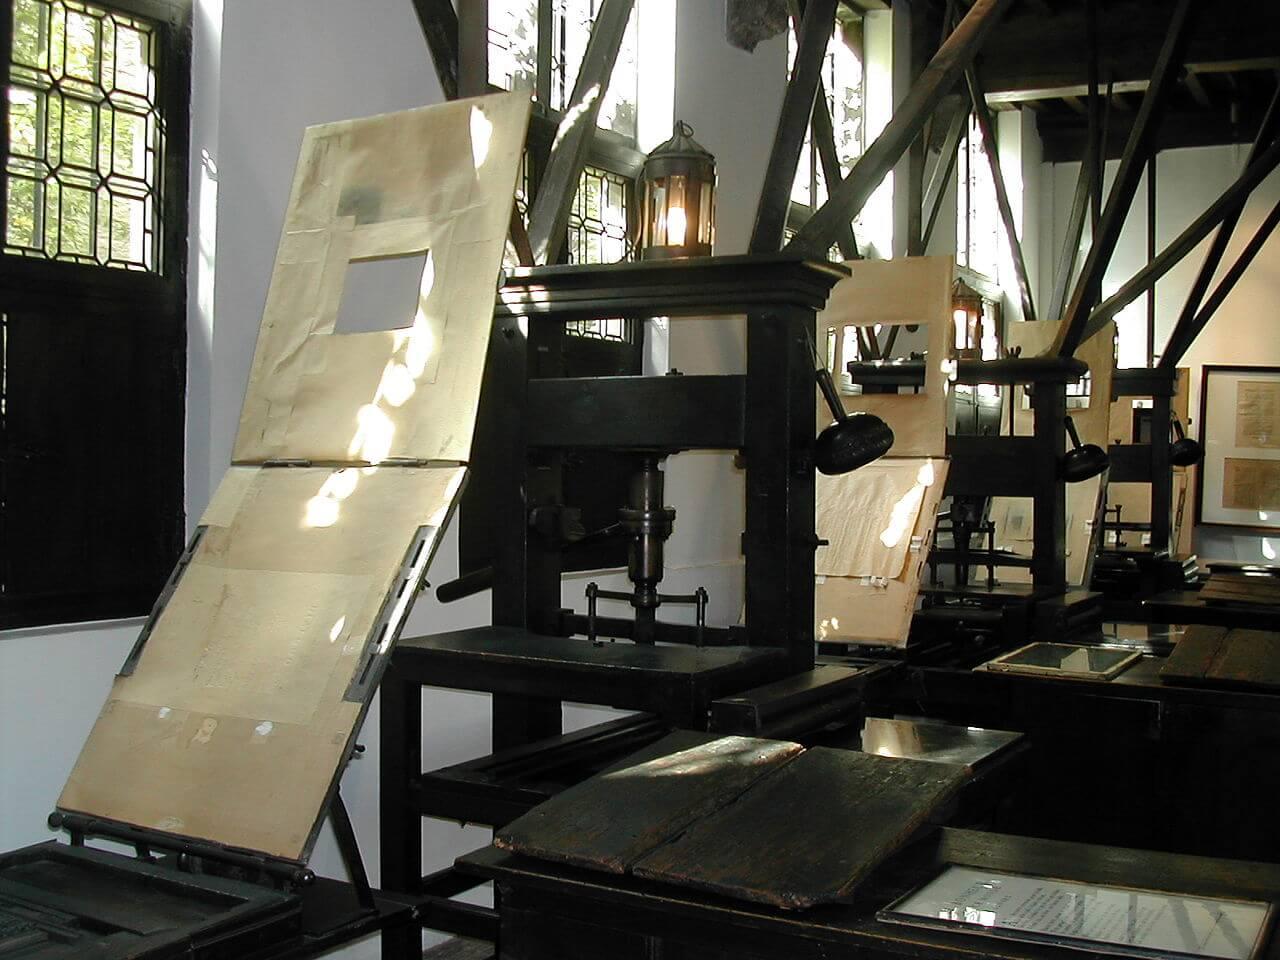 Музей Плантена-Моретуса, печатные станки